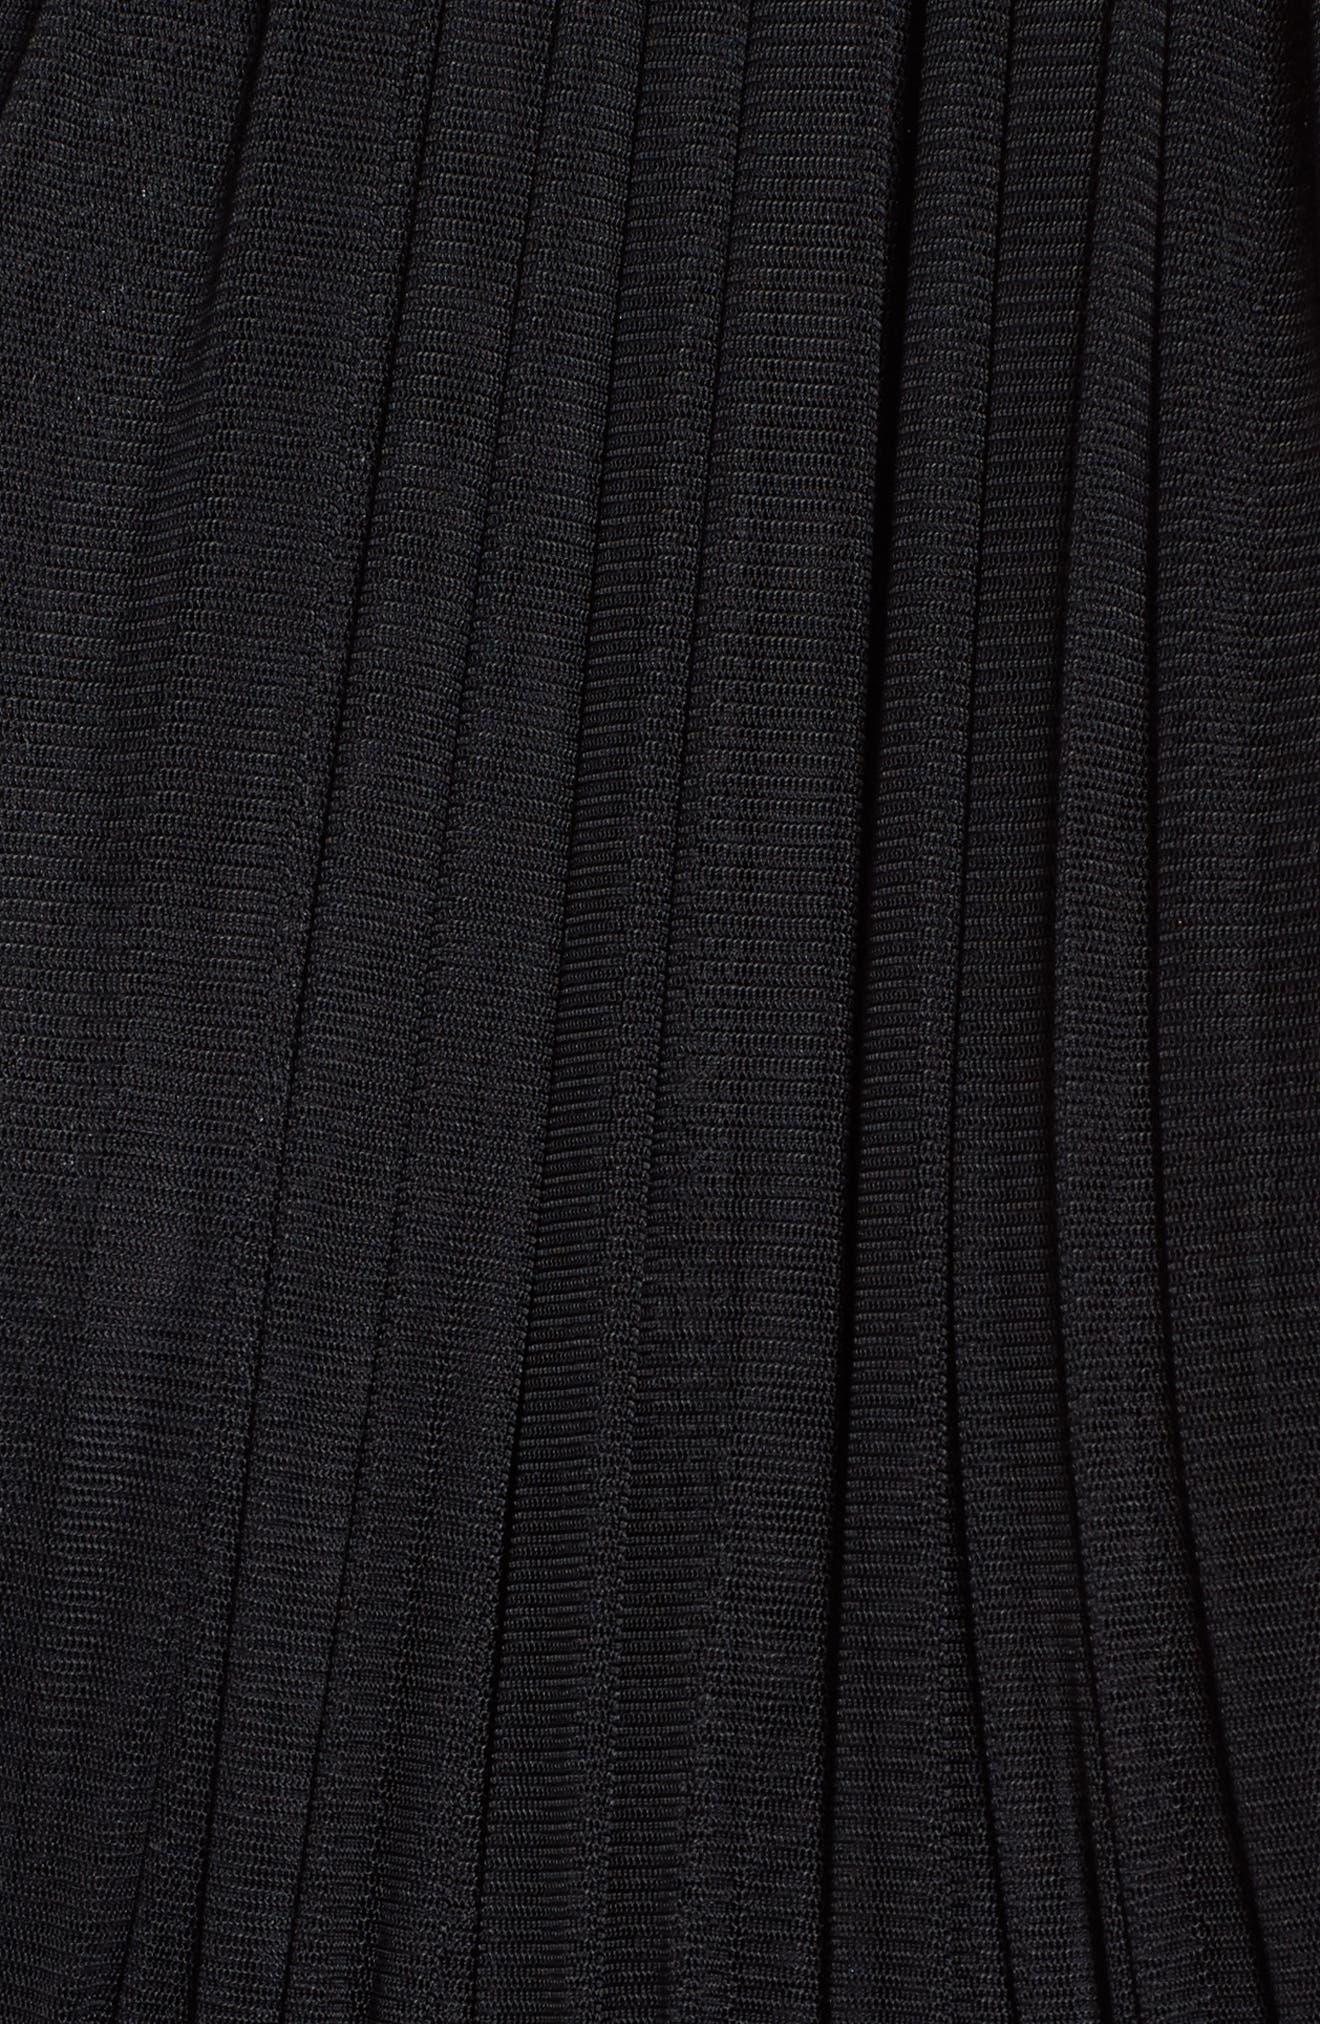 Taylor Halter Maxi Dress,                             Alternate thumbnail 5, color,                             001